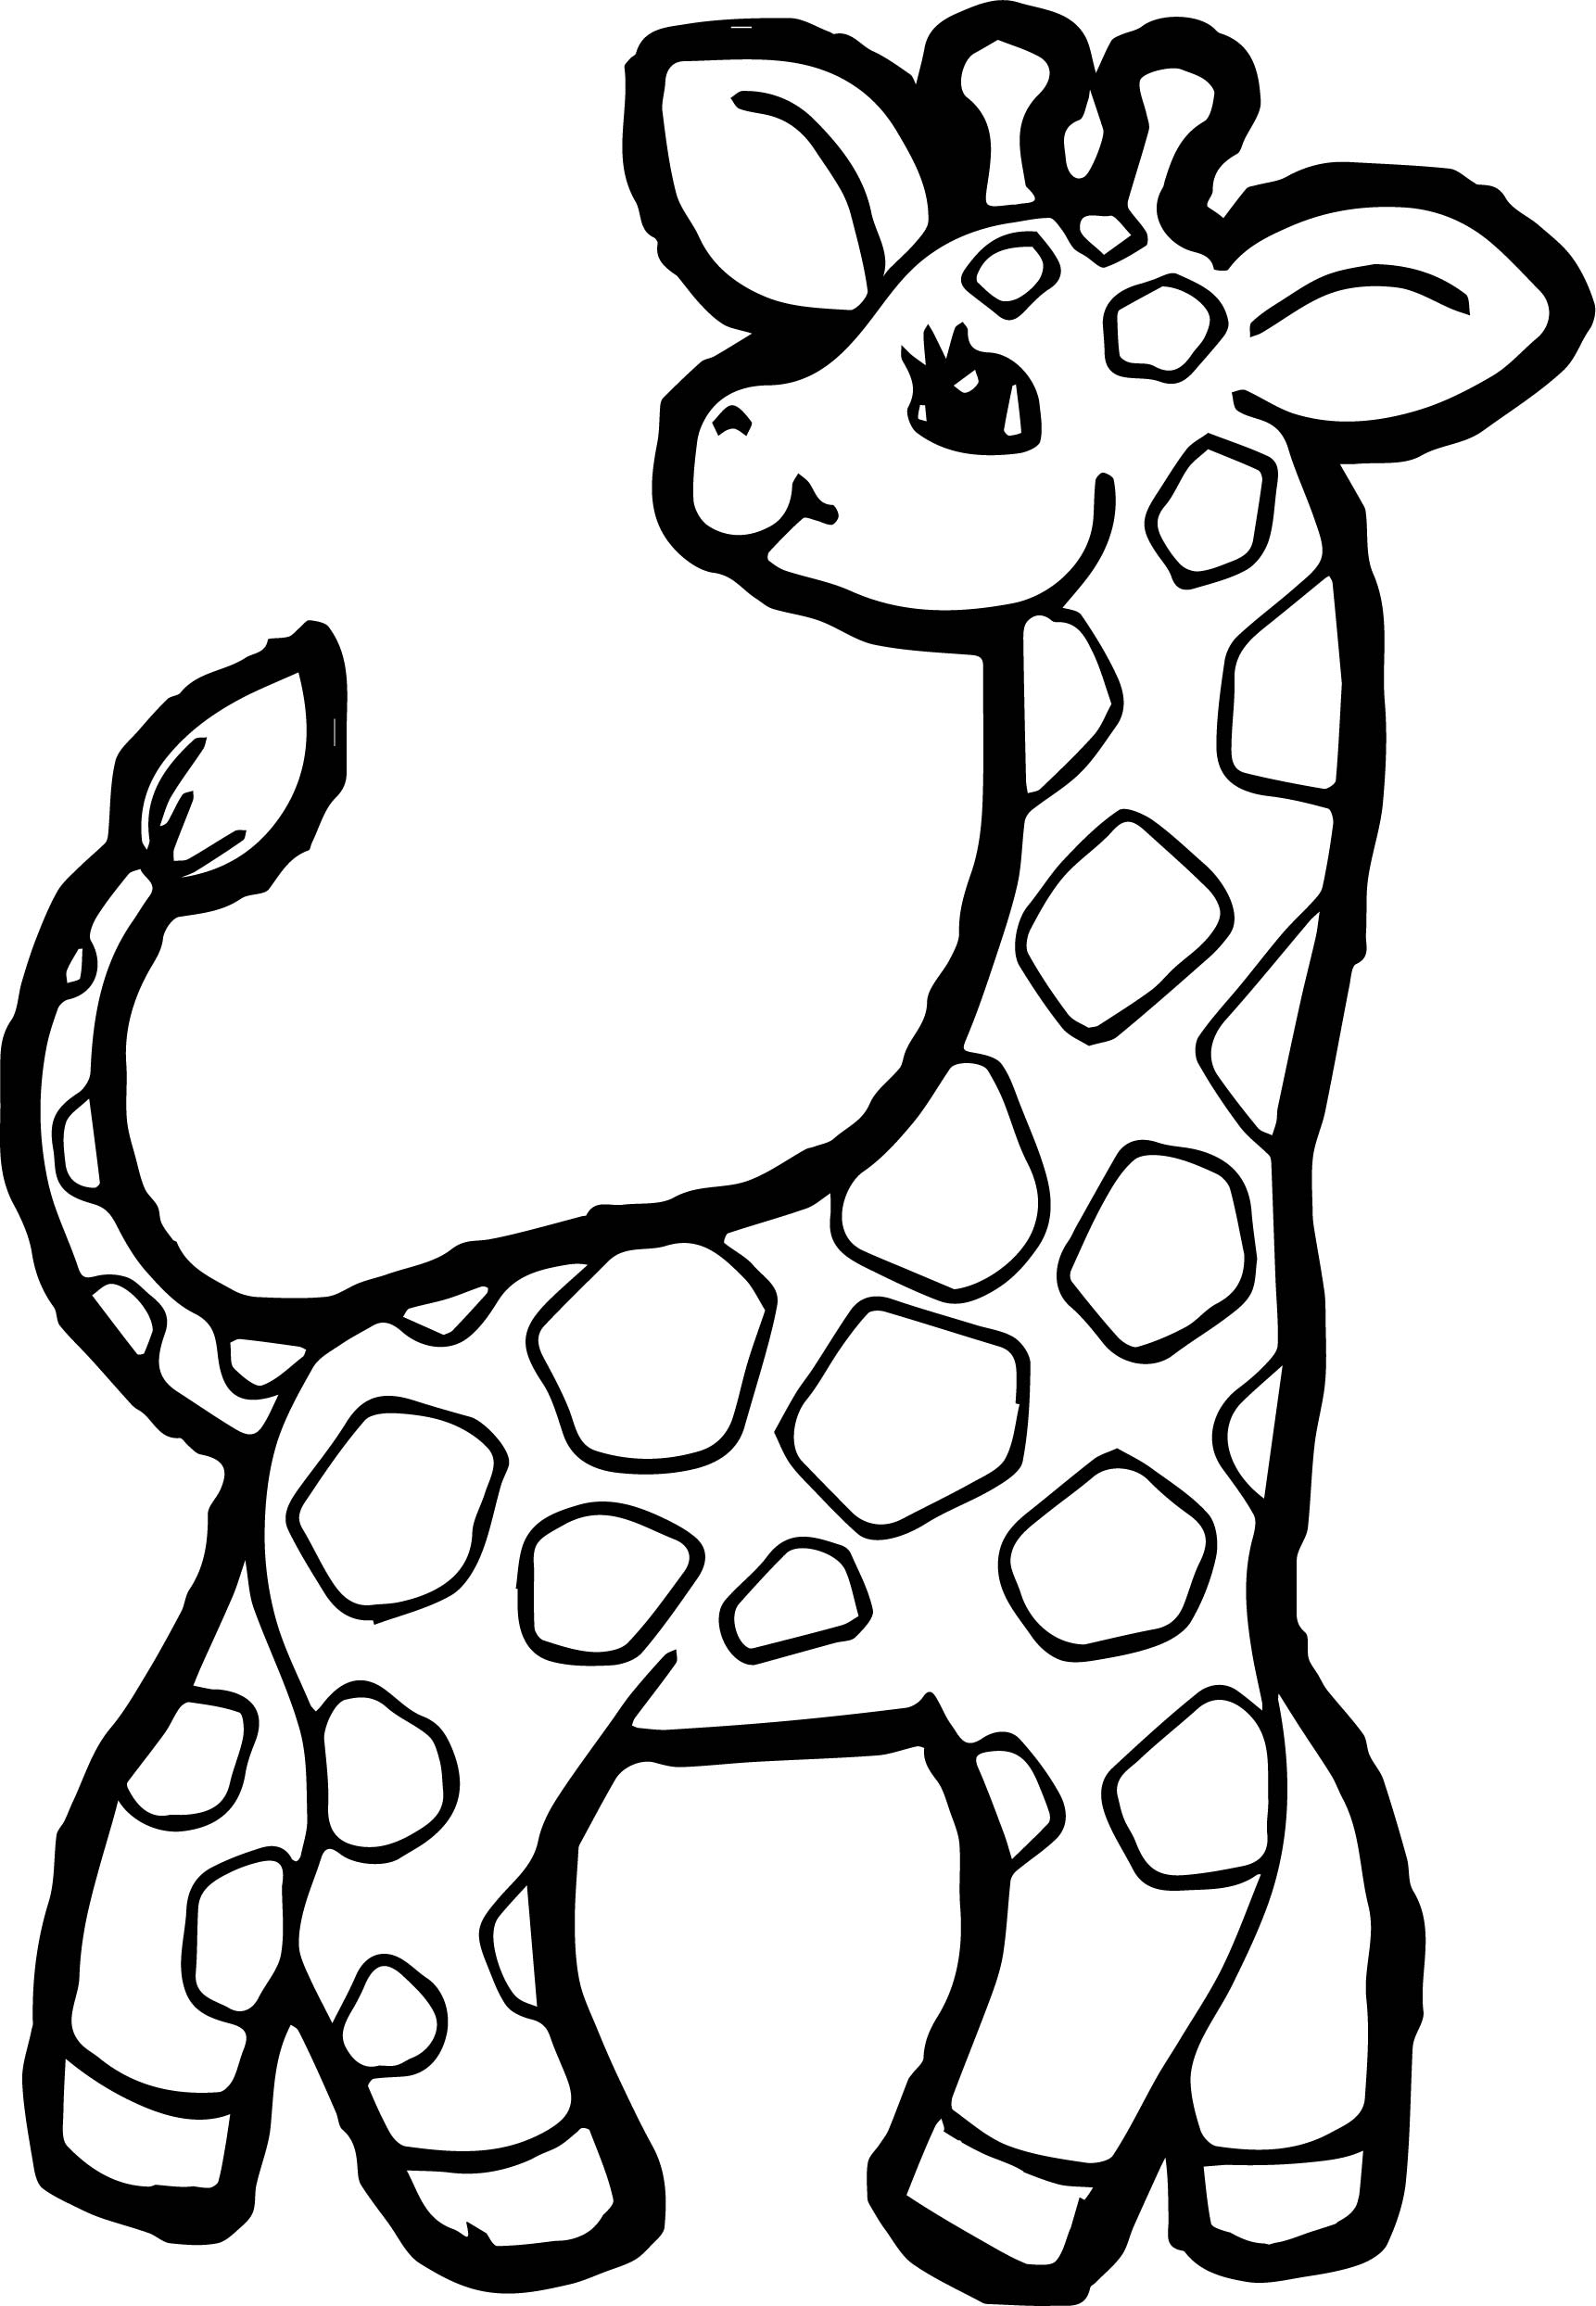 Small giraffe coloring page